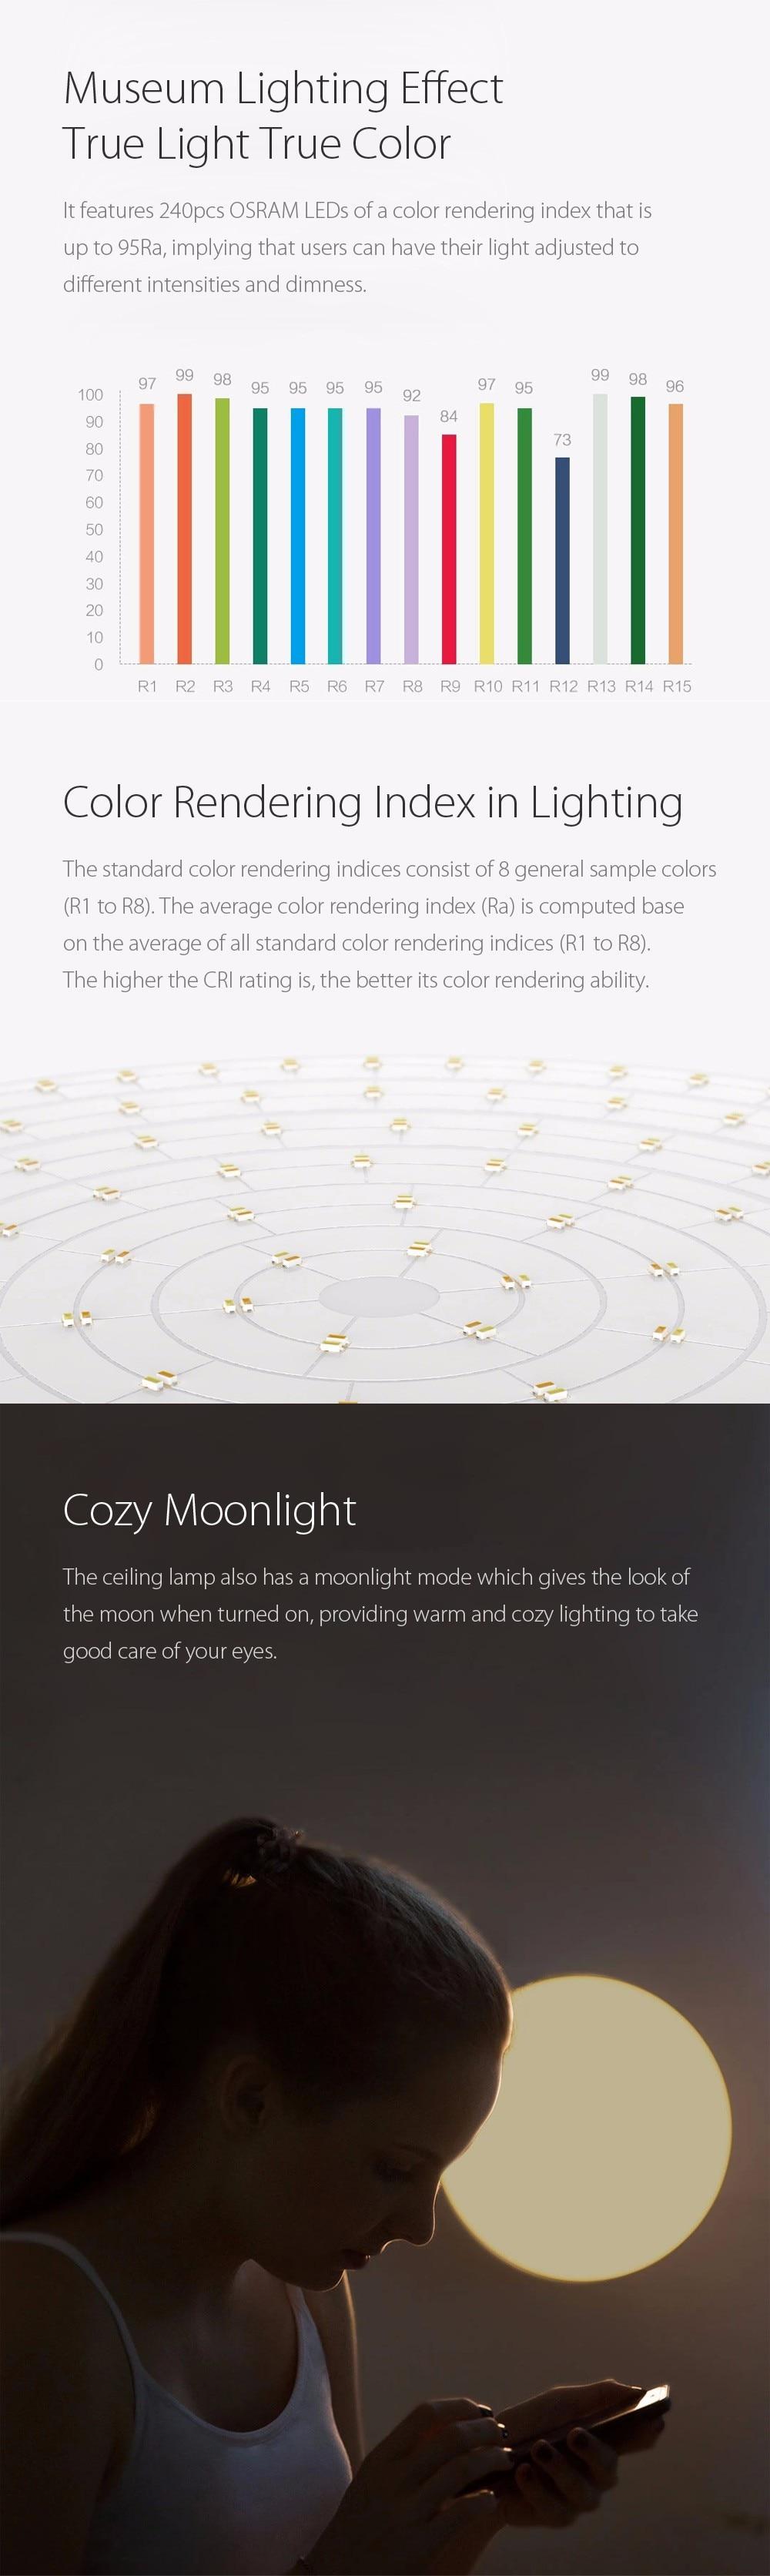 HTB1Q0bYX4rI8KJjy0Fpq6z5hVXaZ Mijia Yeelight Ceiling Light Pro 450/480/650mm Remote APP WIFI Bluetooth Control Smart LED Color IP60 Dustproof Ceiling Lamp